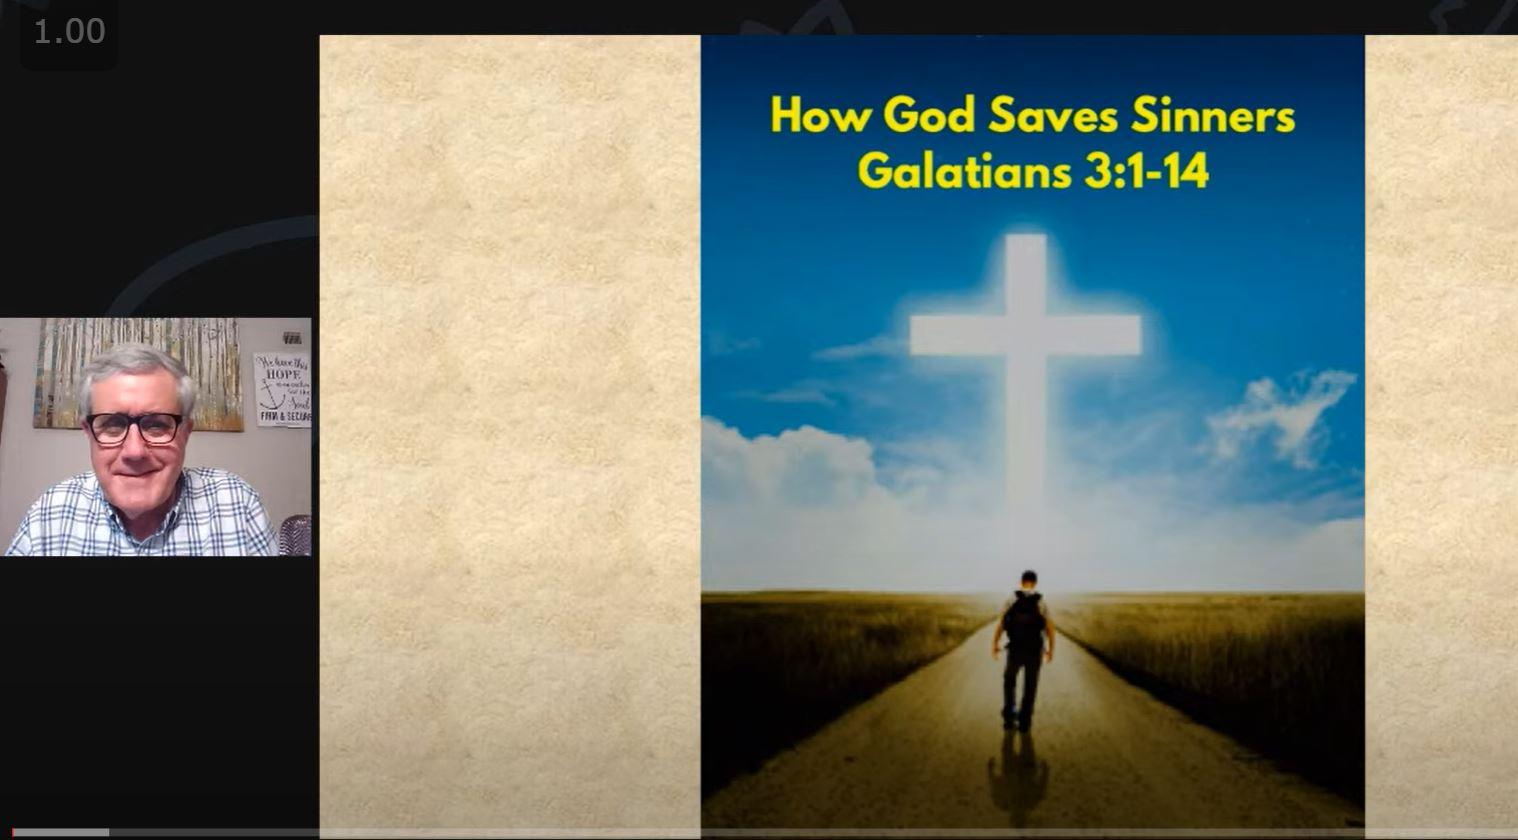 How God Saves Sinners (Galatians 3:1-14)